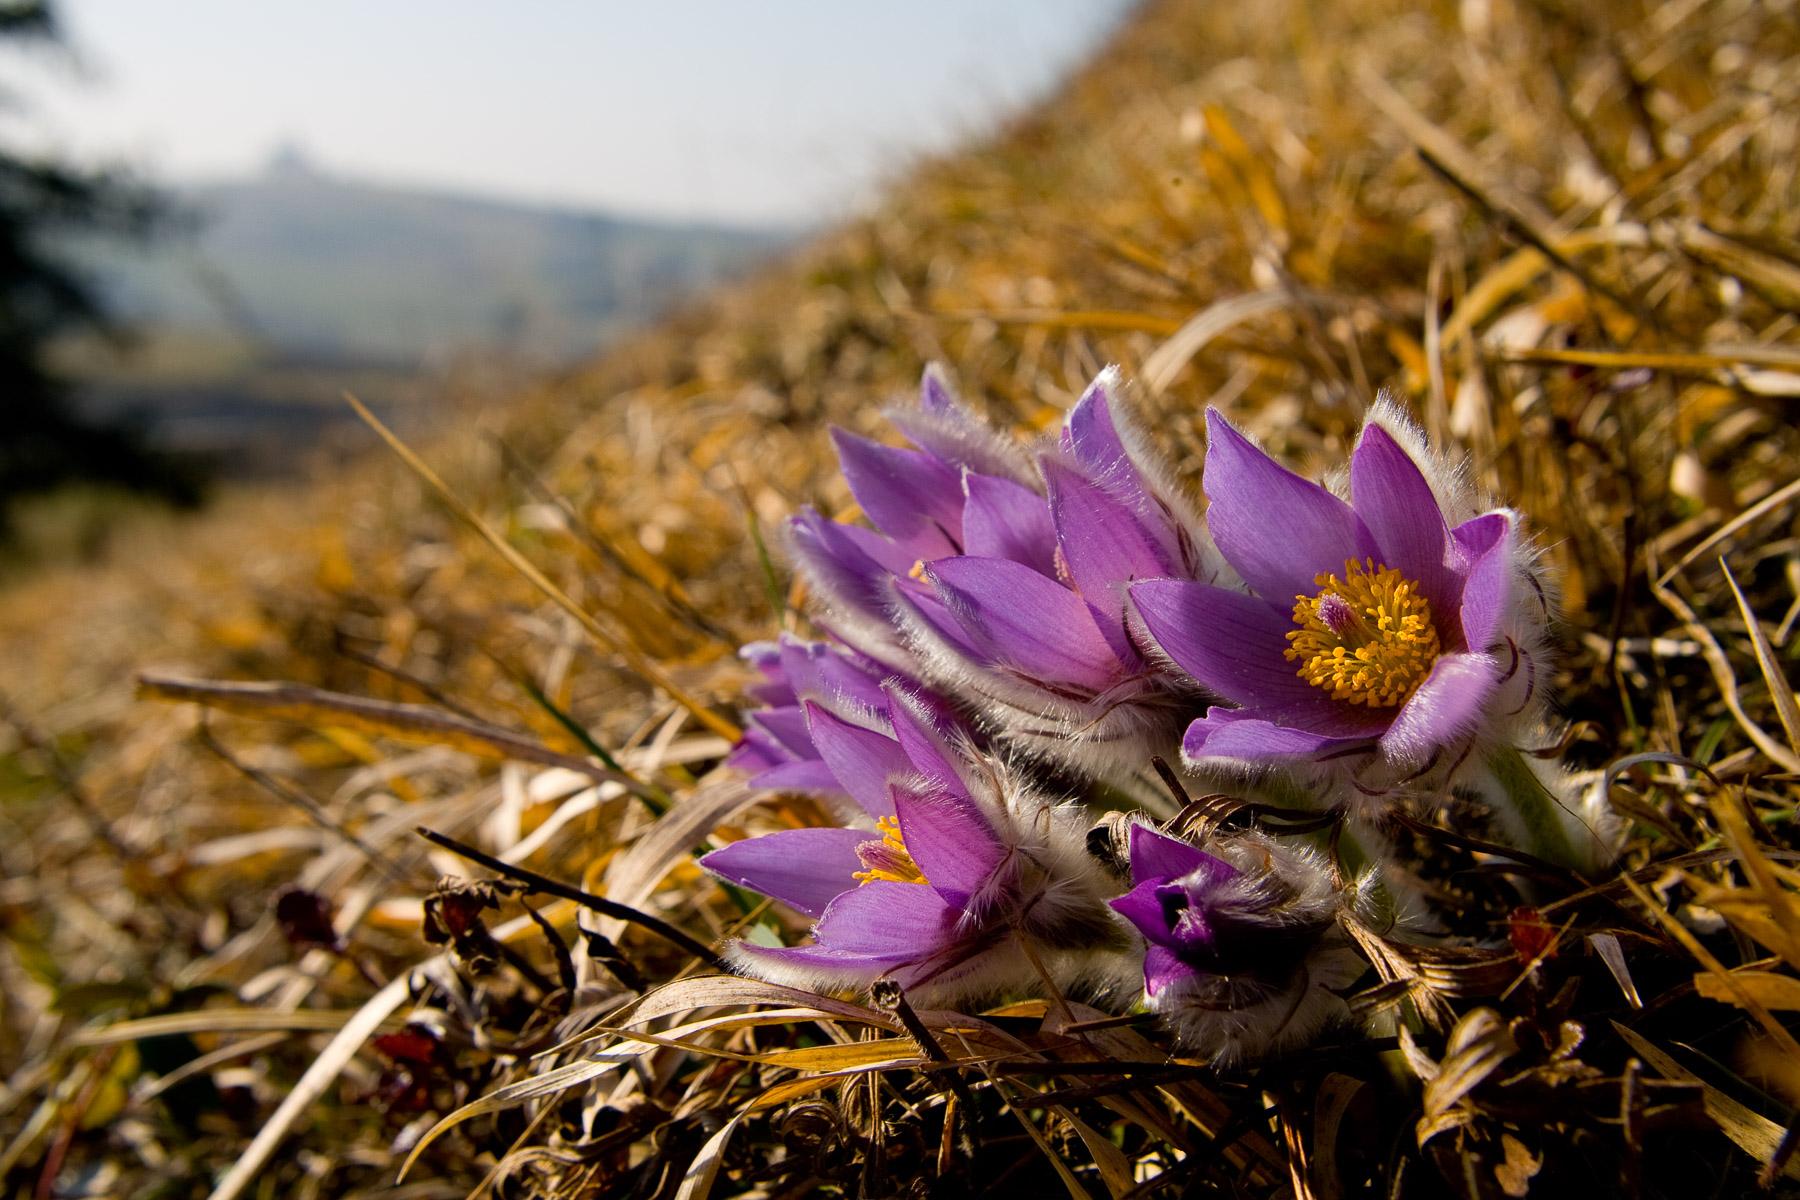 Velikonočnica (grows on Boč)